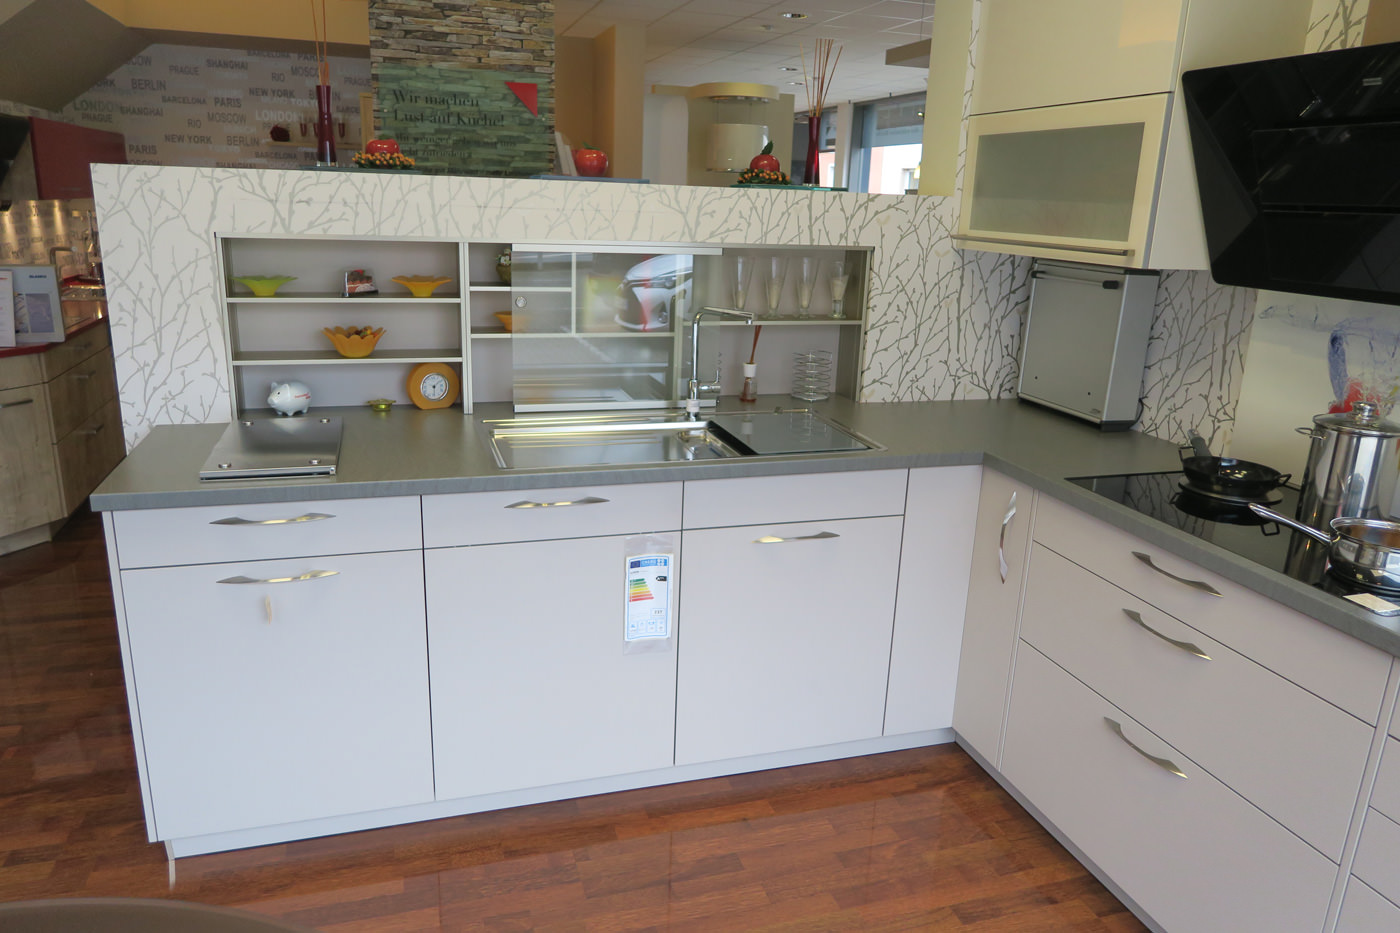 Full Size of Küche Finanzieren Trotz Hauskredit Küche Finanzieren Sinnvoll Küche Finanzieren Höffner Küche Finanzieren 0 Prozent Küche Küche Finanzieren